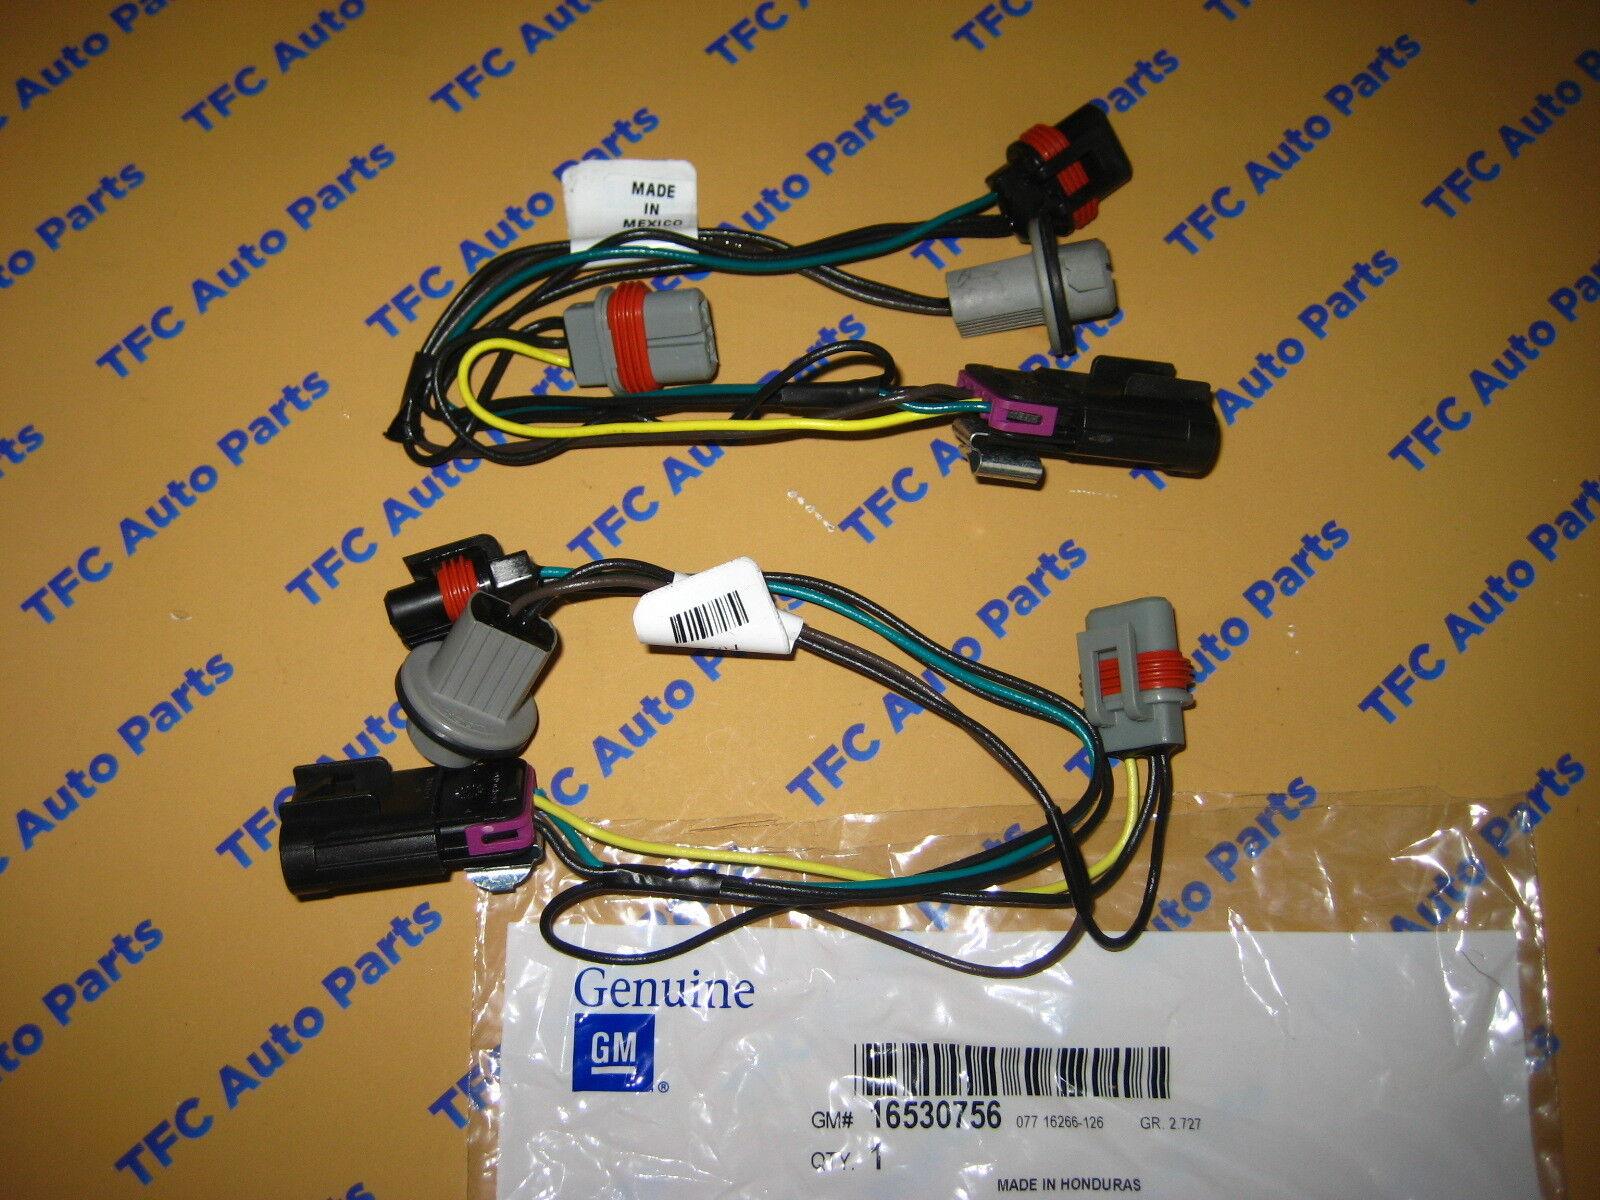 2008 grand prix wiring harness 2008 image wiring 2 pontiac grand prix front head light wiring harness oem new 2004 on 2008 grand prix